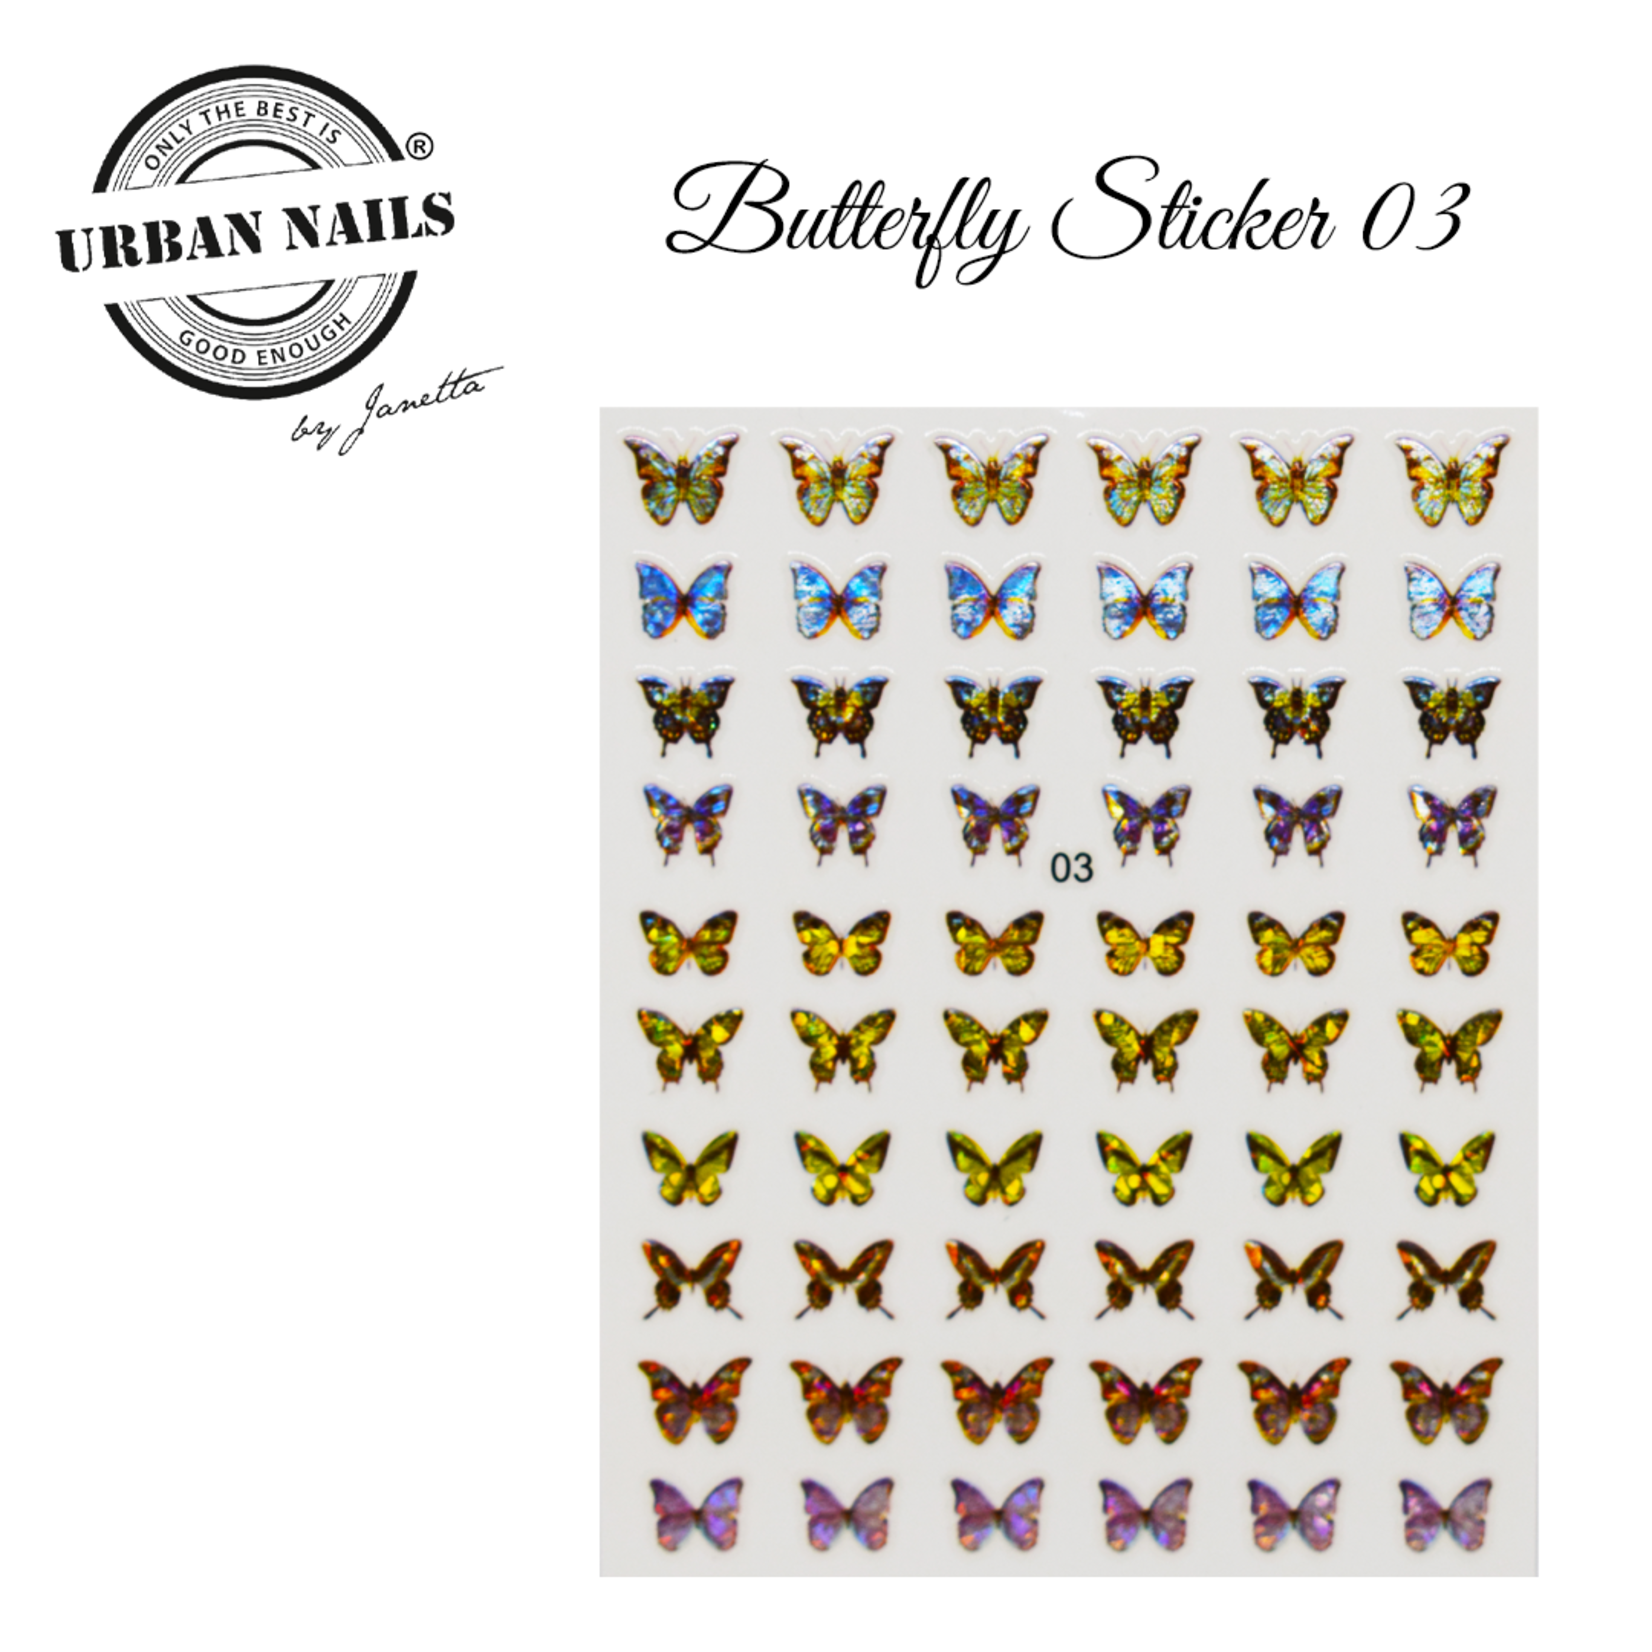 Urban Nails Butterfly Sticker 03